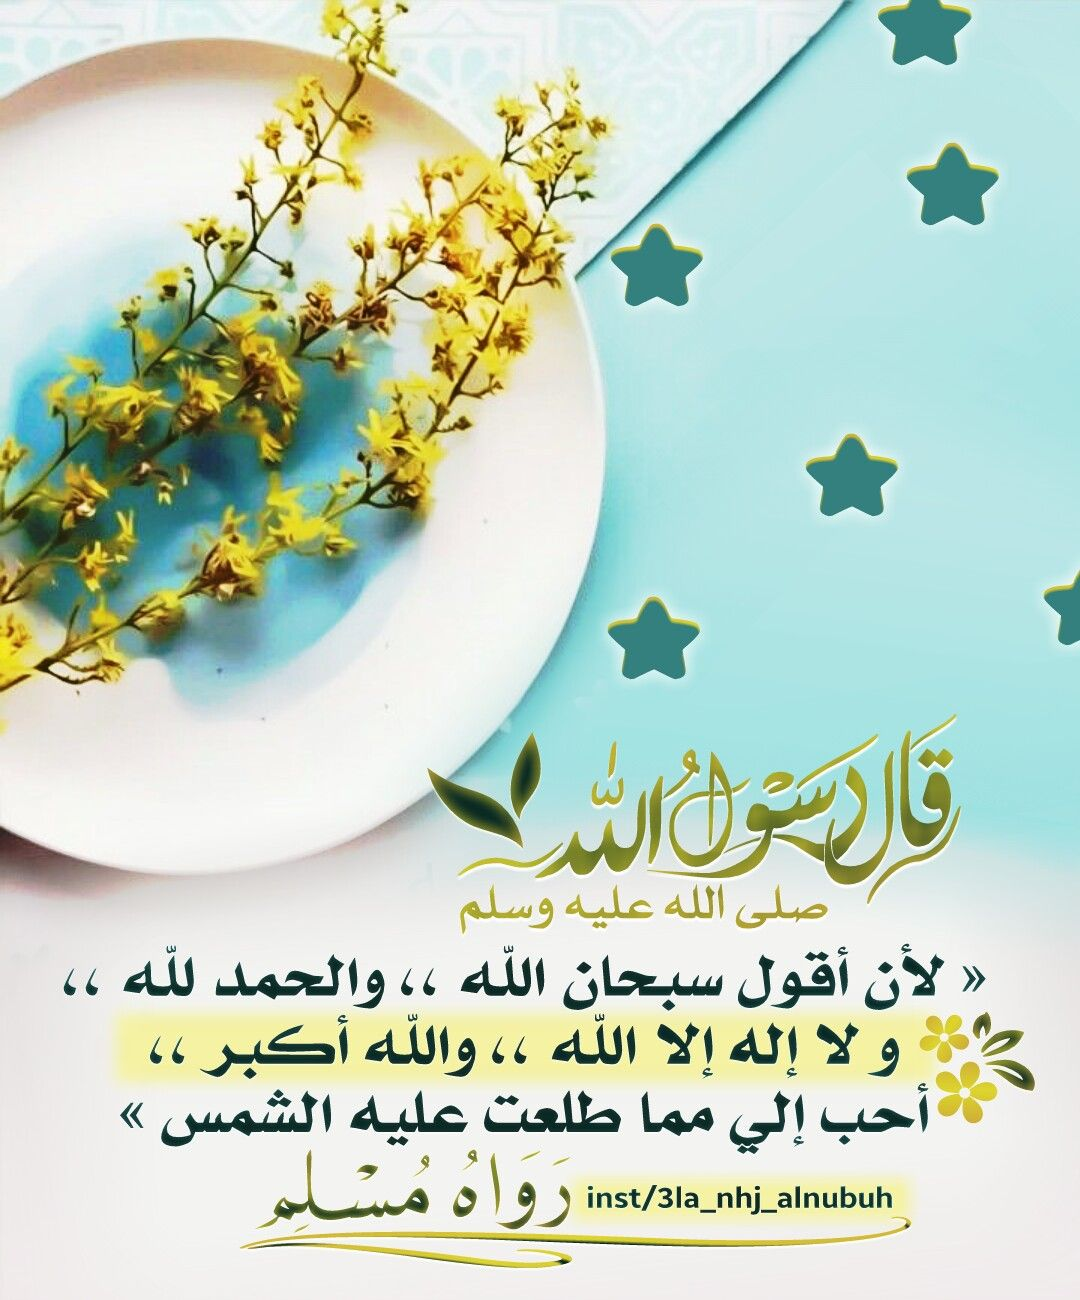 Pin By Um Ahmad On صور إسلامية Romantic Love Quotes Cake Romantic Love